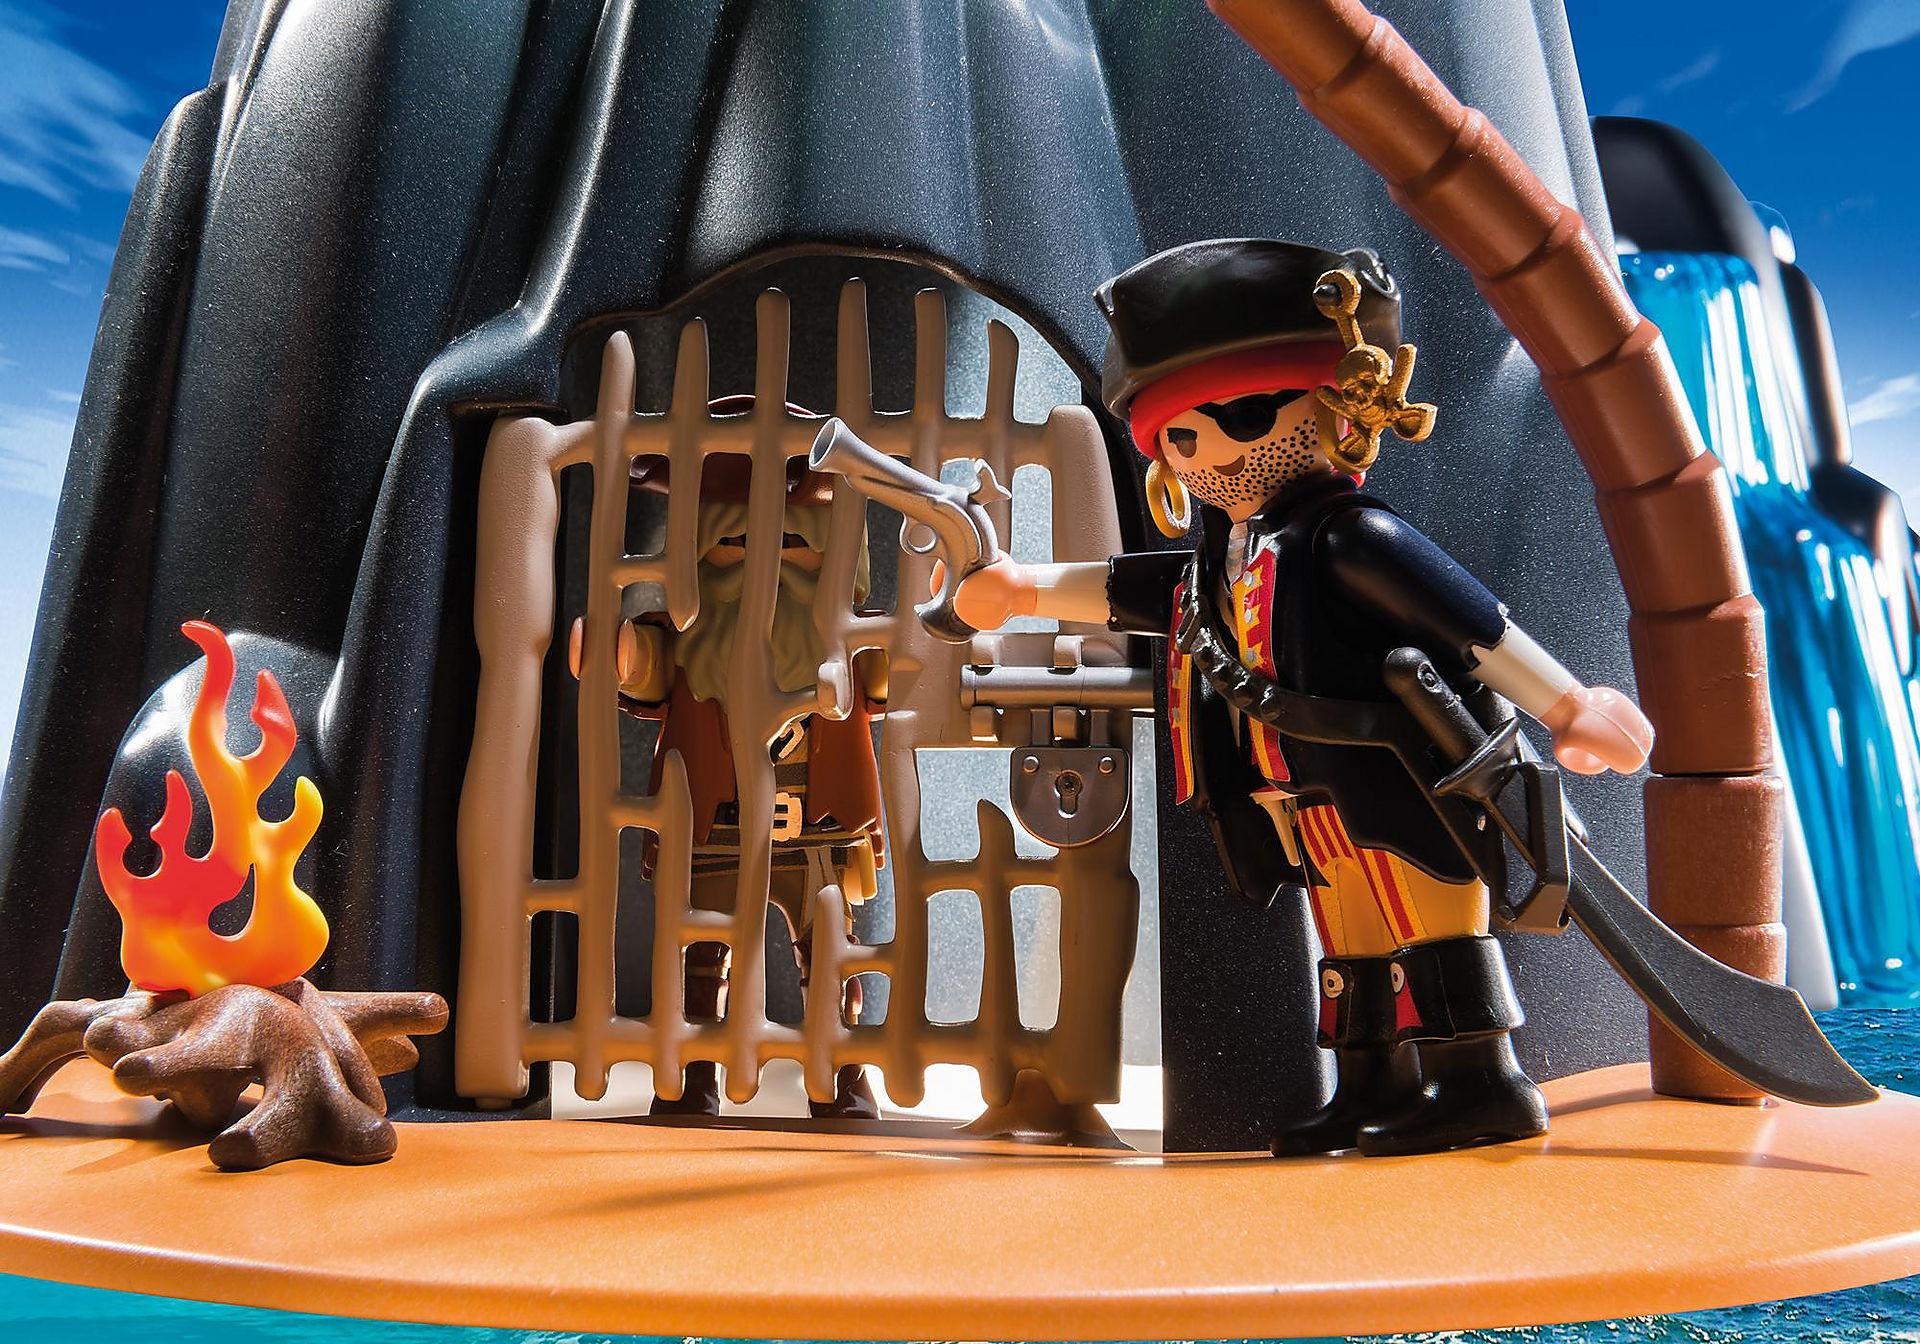 6679 Isola del tesoro fortificata zoom image7